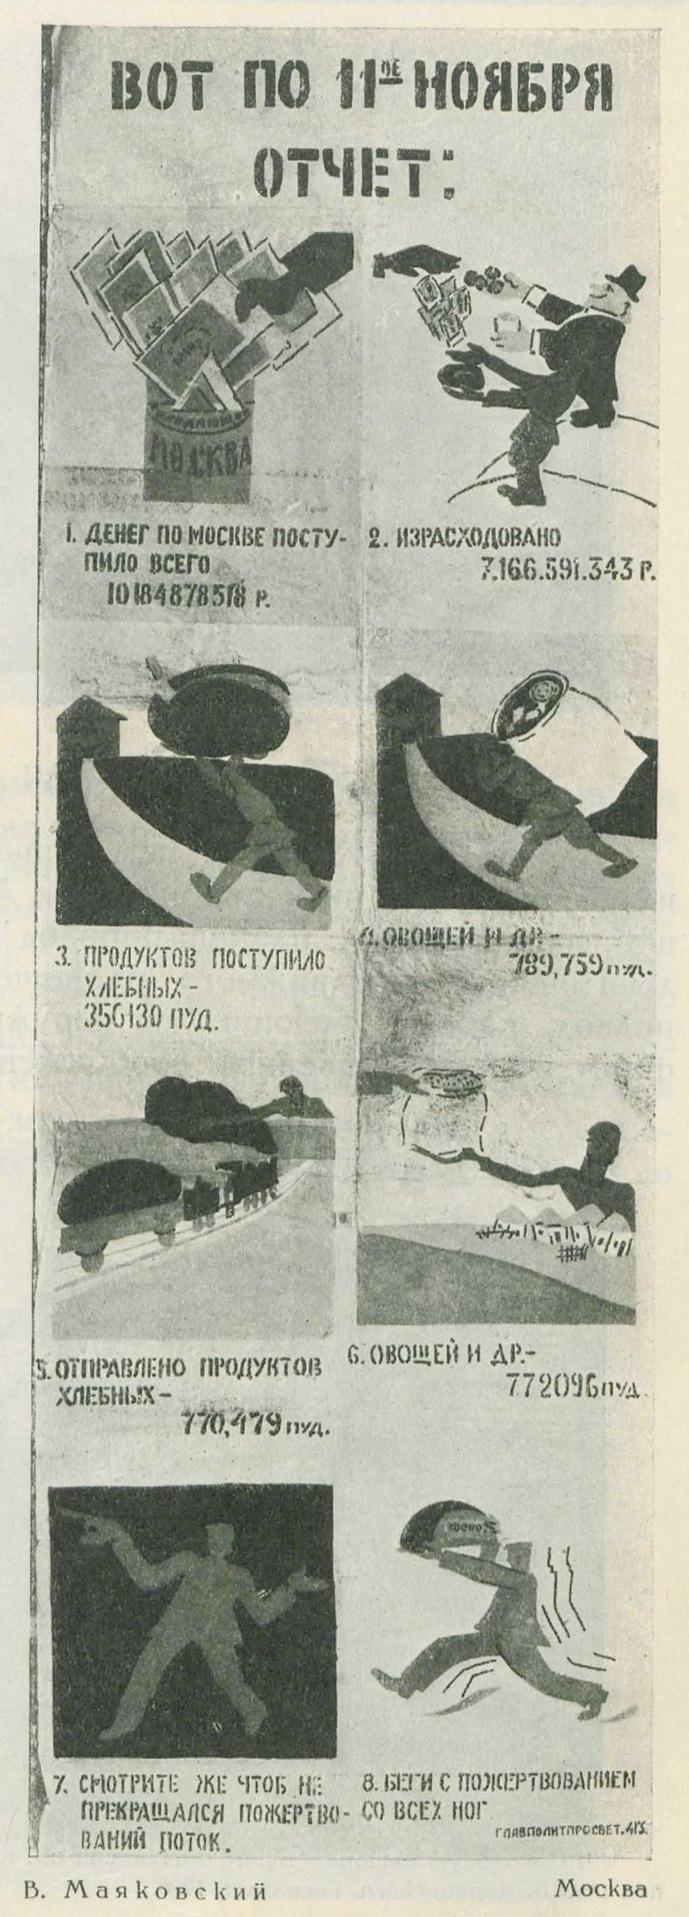 В. Маяковский. Москва. «Вот по 11-ое ноября отчет...»